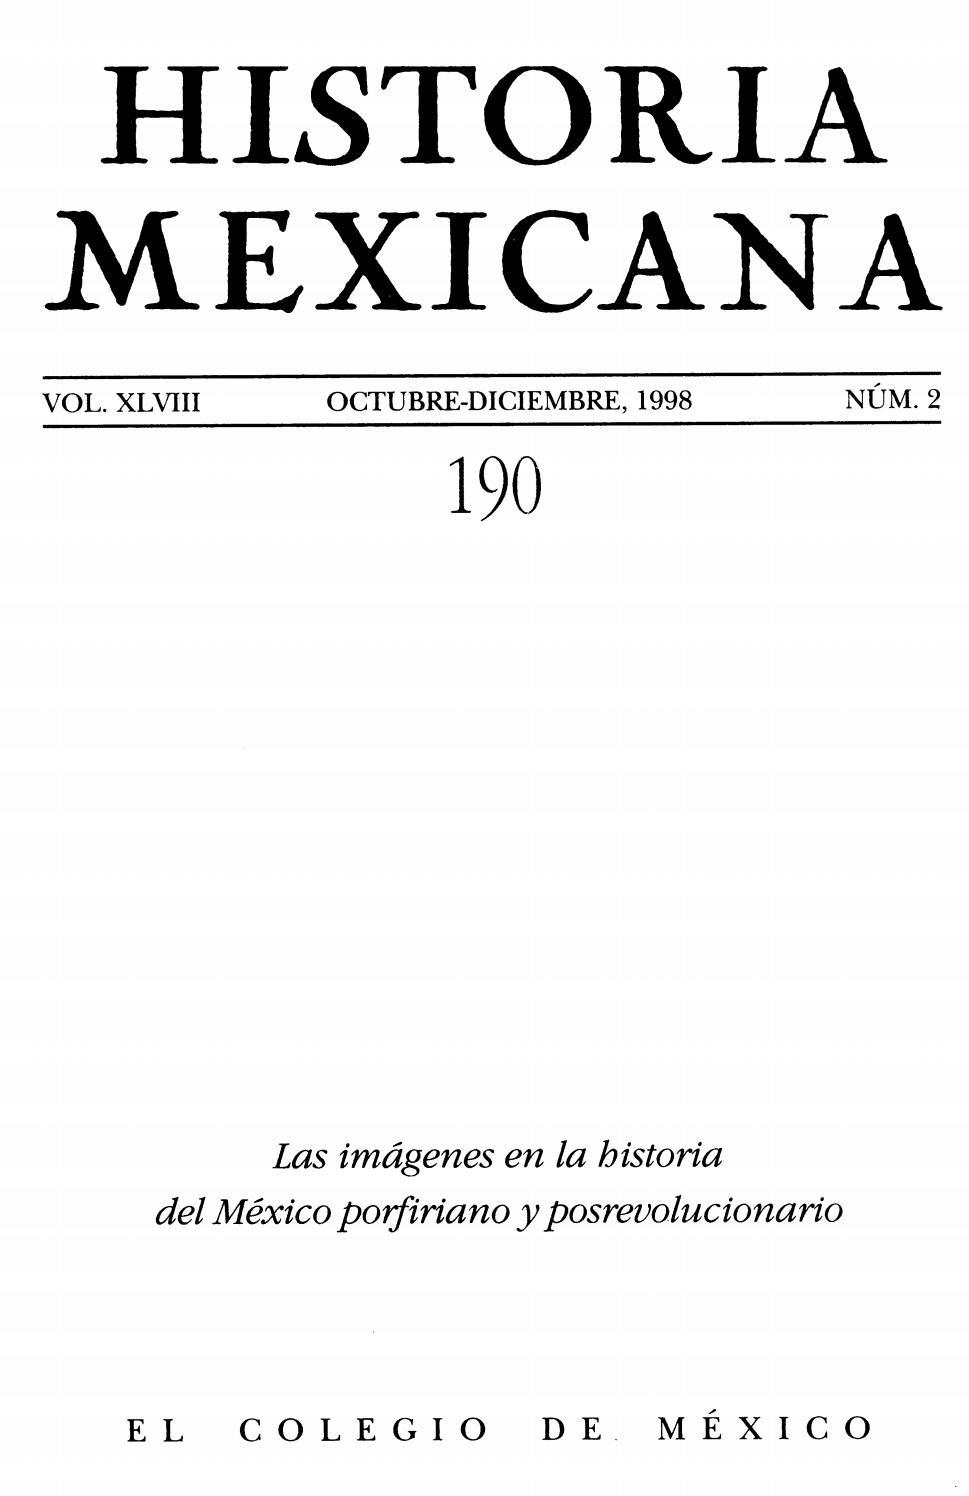 Historia mexicana 190 volumen 48 número 2 by Ce Ocelotl - issuu